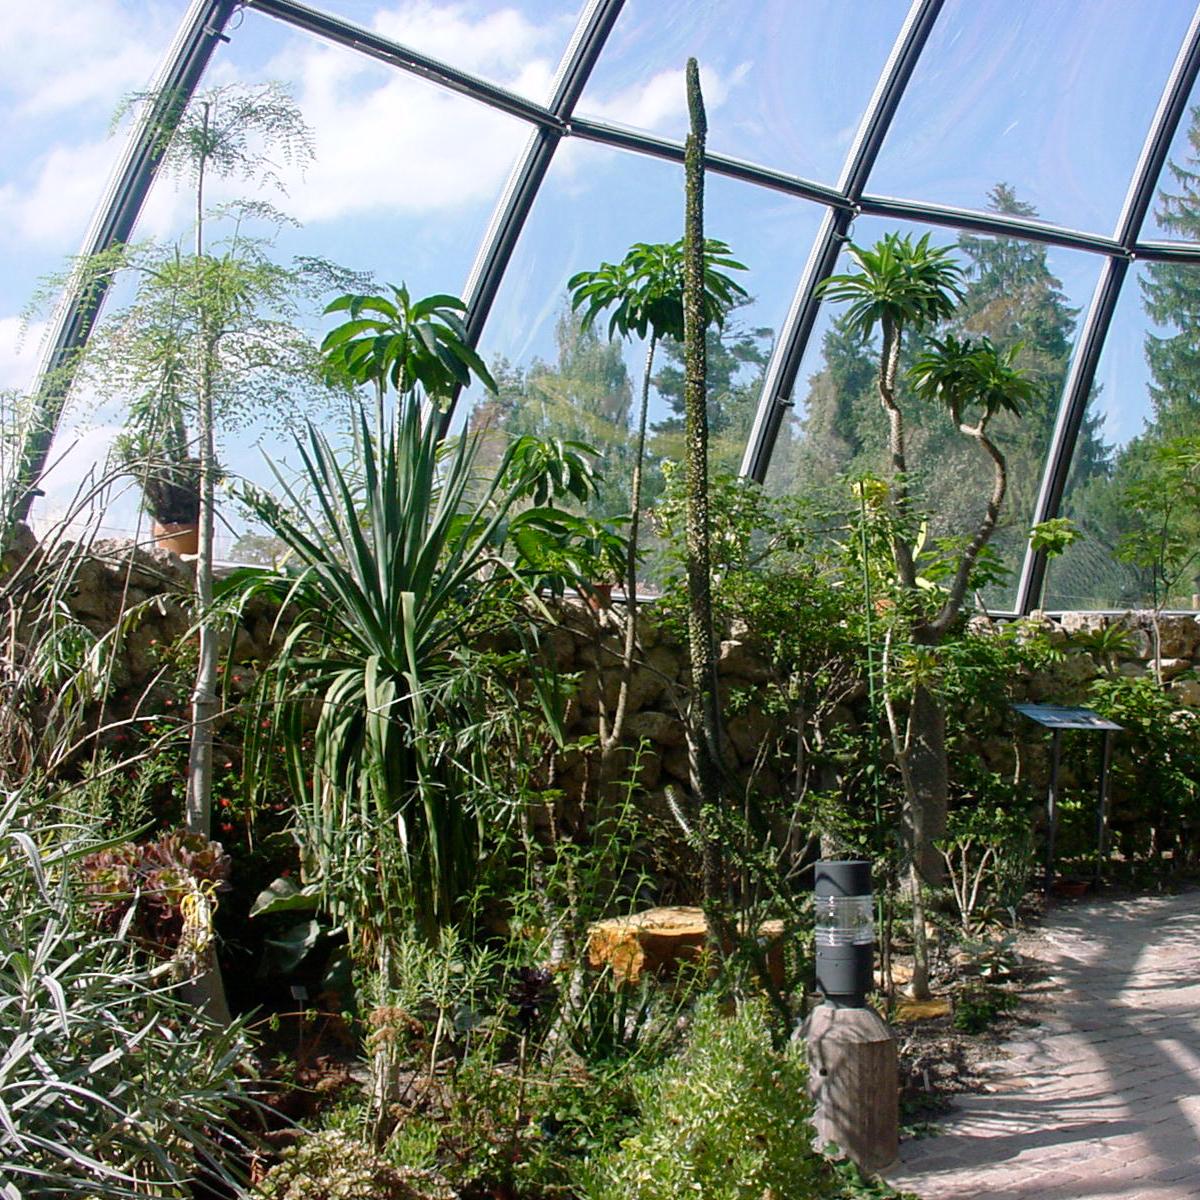 Botanischer Garten Zuerich Kakteen